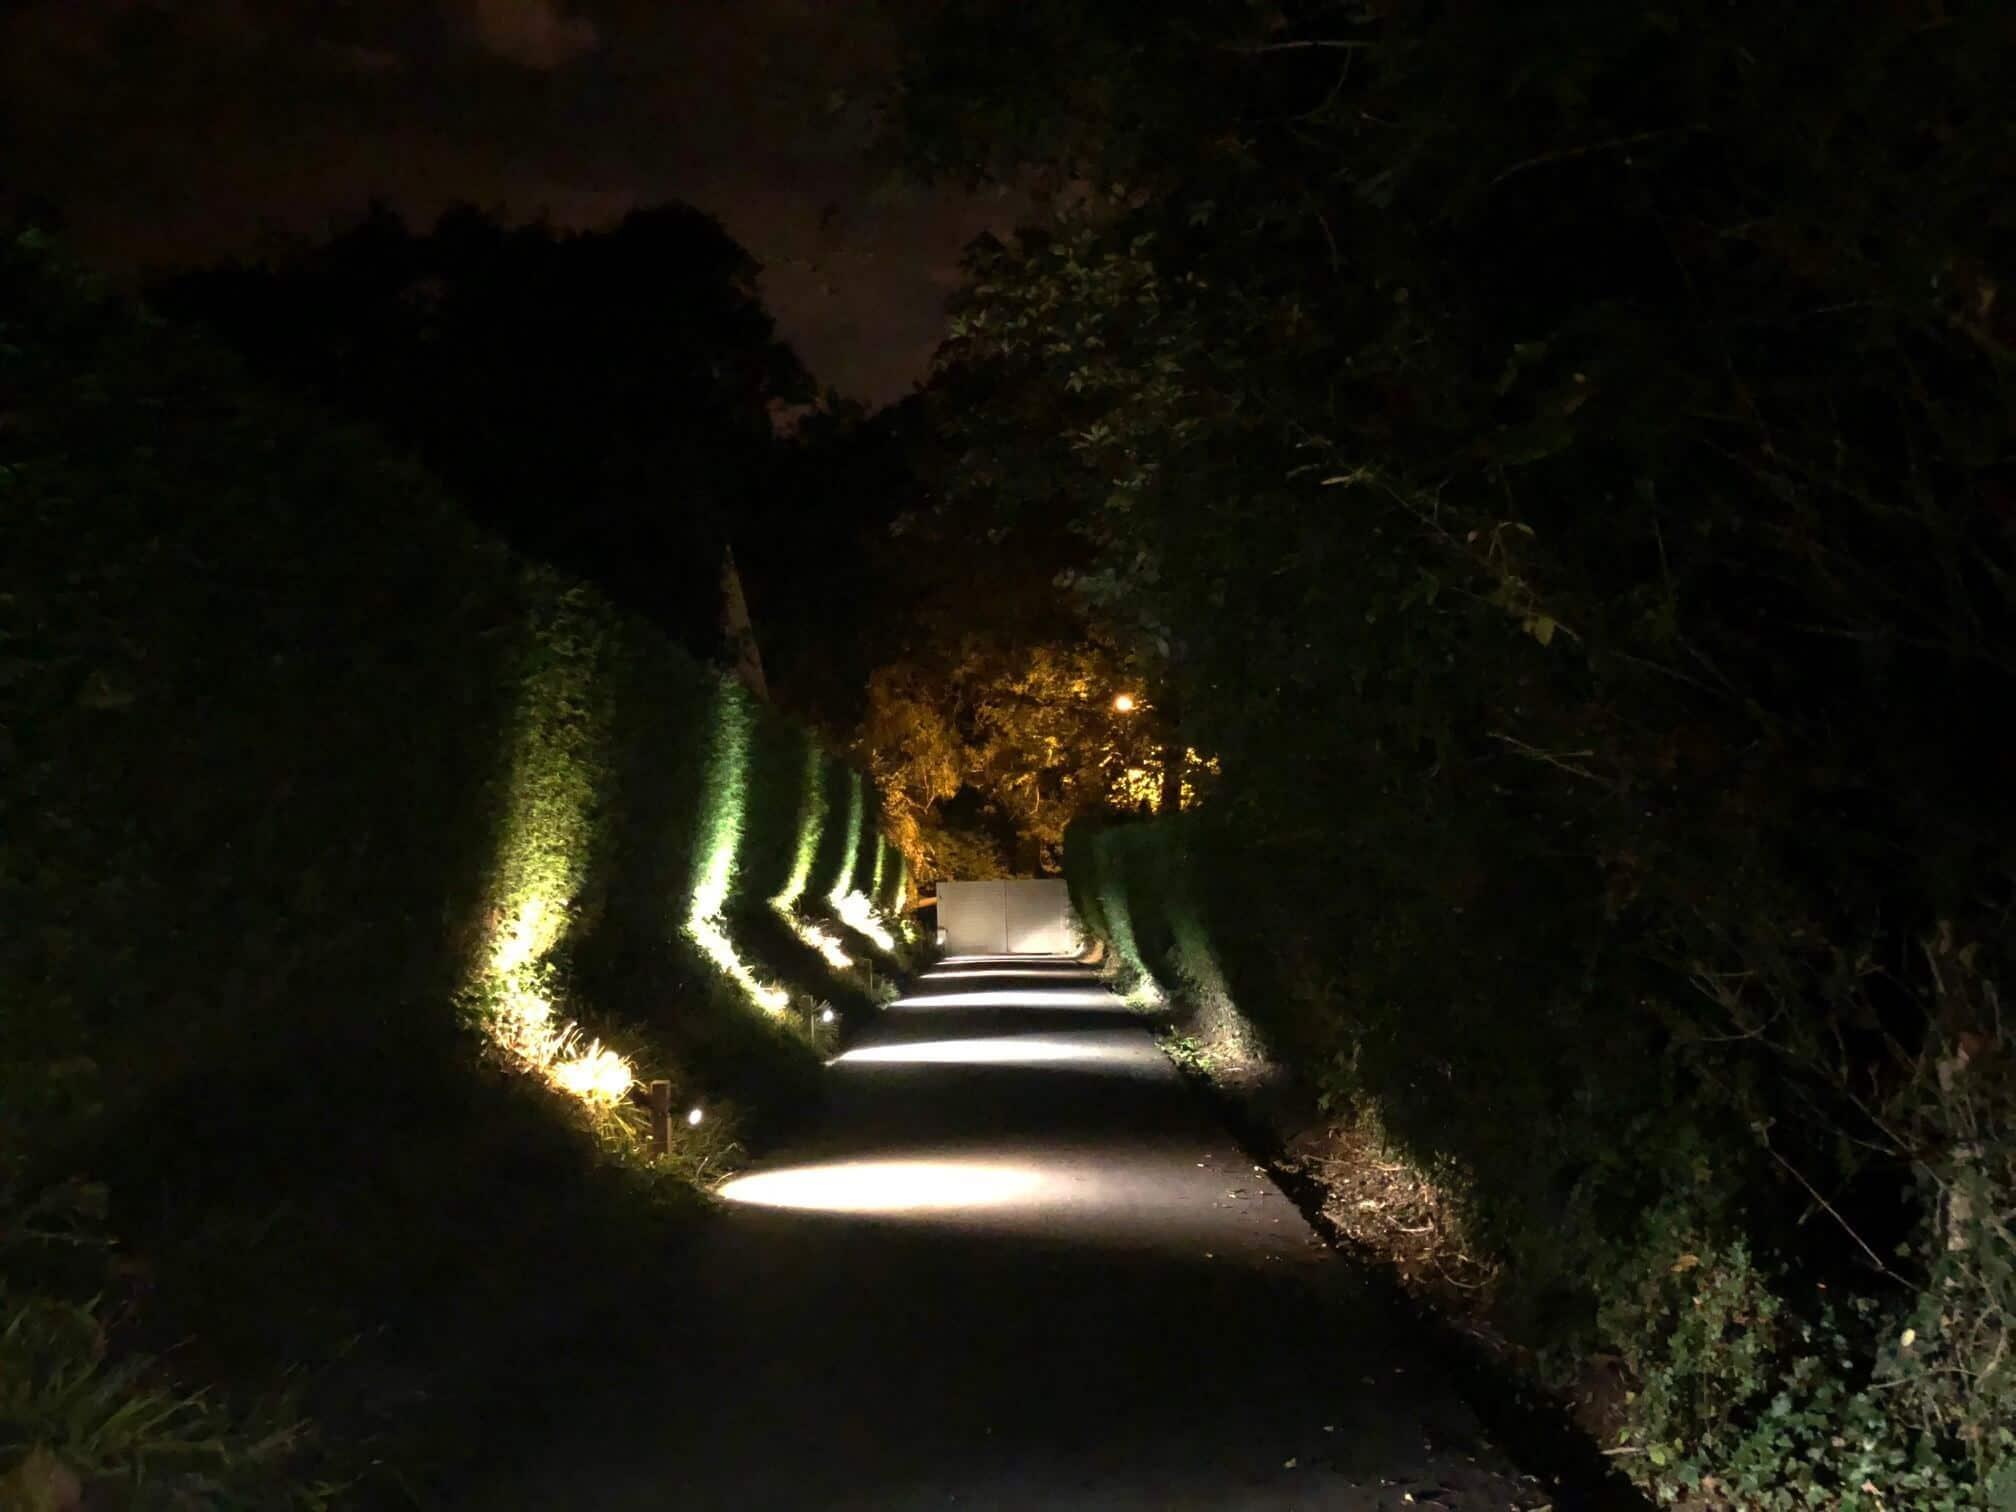 night-elec-jardin-galerie-electricite-vanhoyesprl